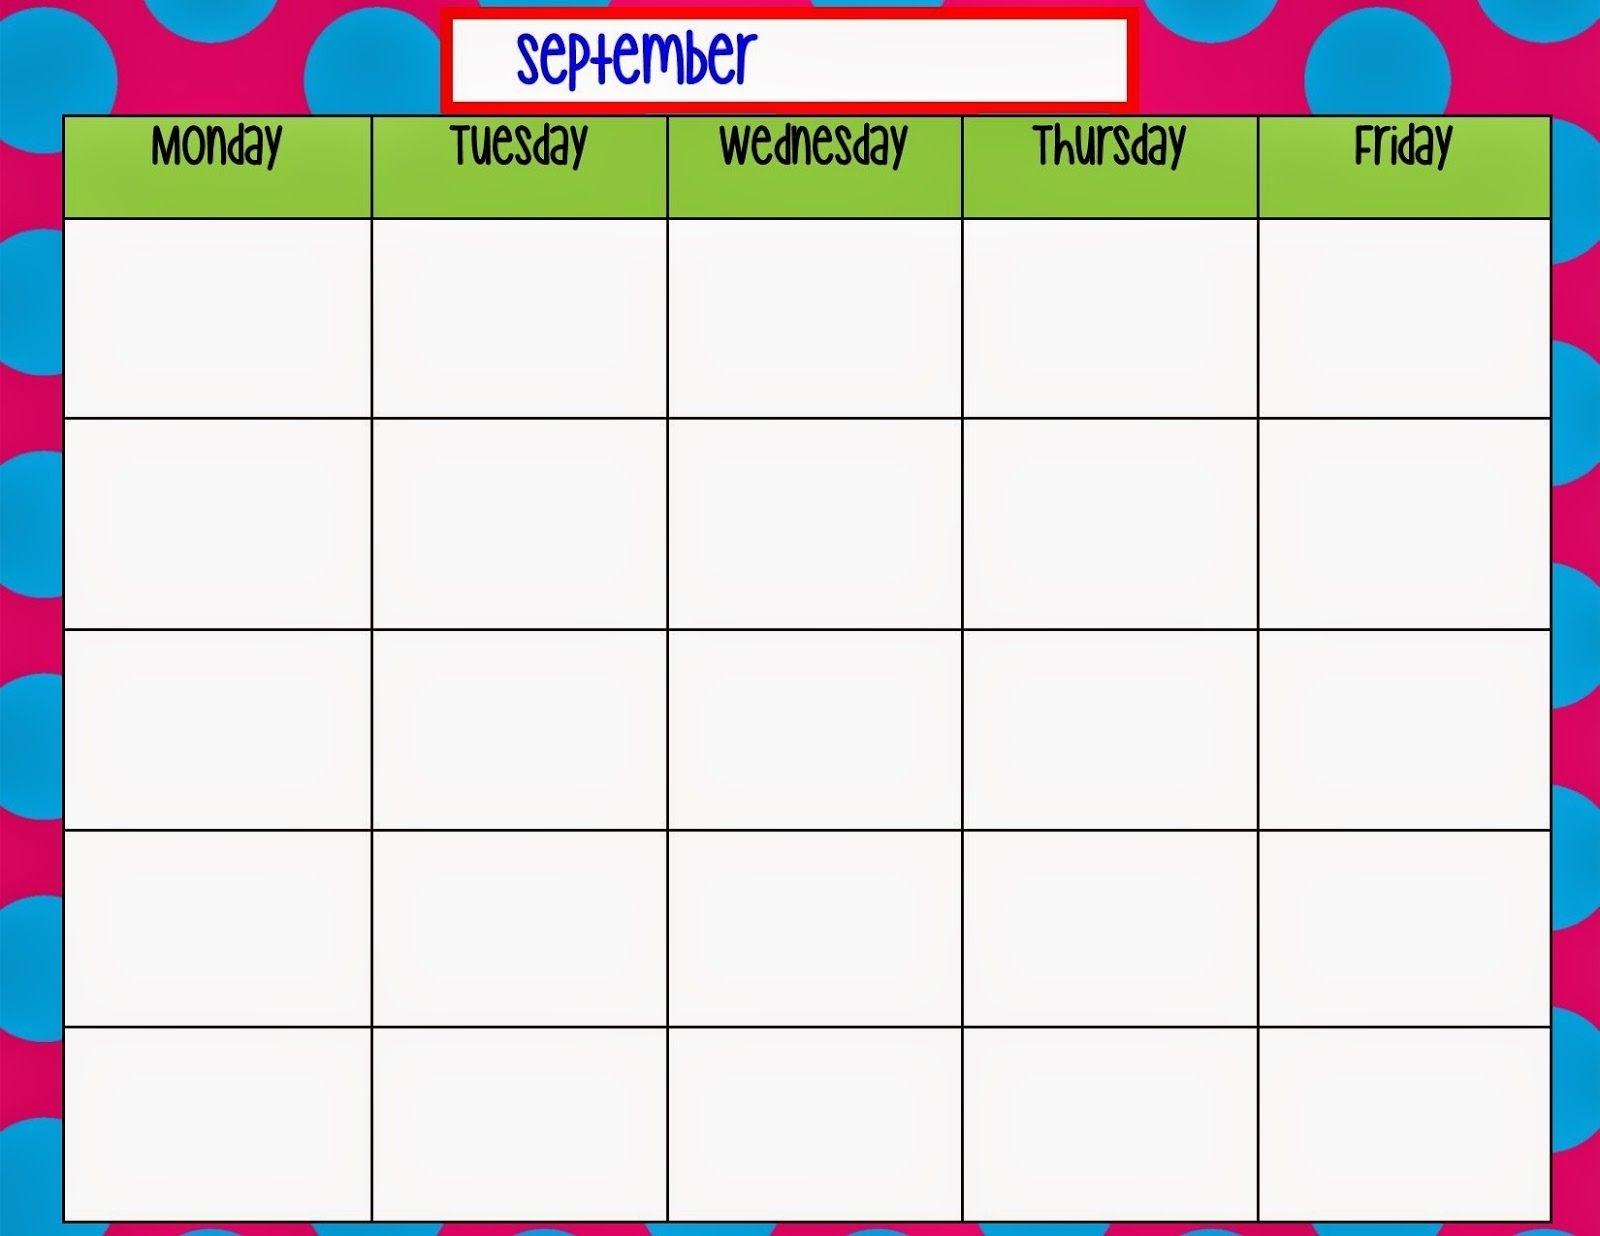 Remarkable Blank Monday To Friday Calendar Template pertaining to Printable Monday Through Friday Calendar